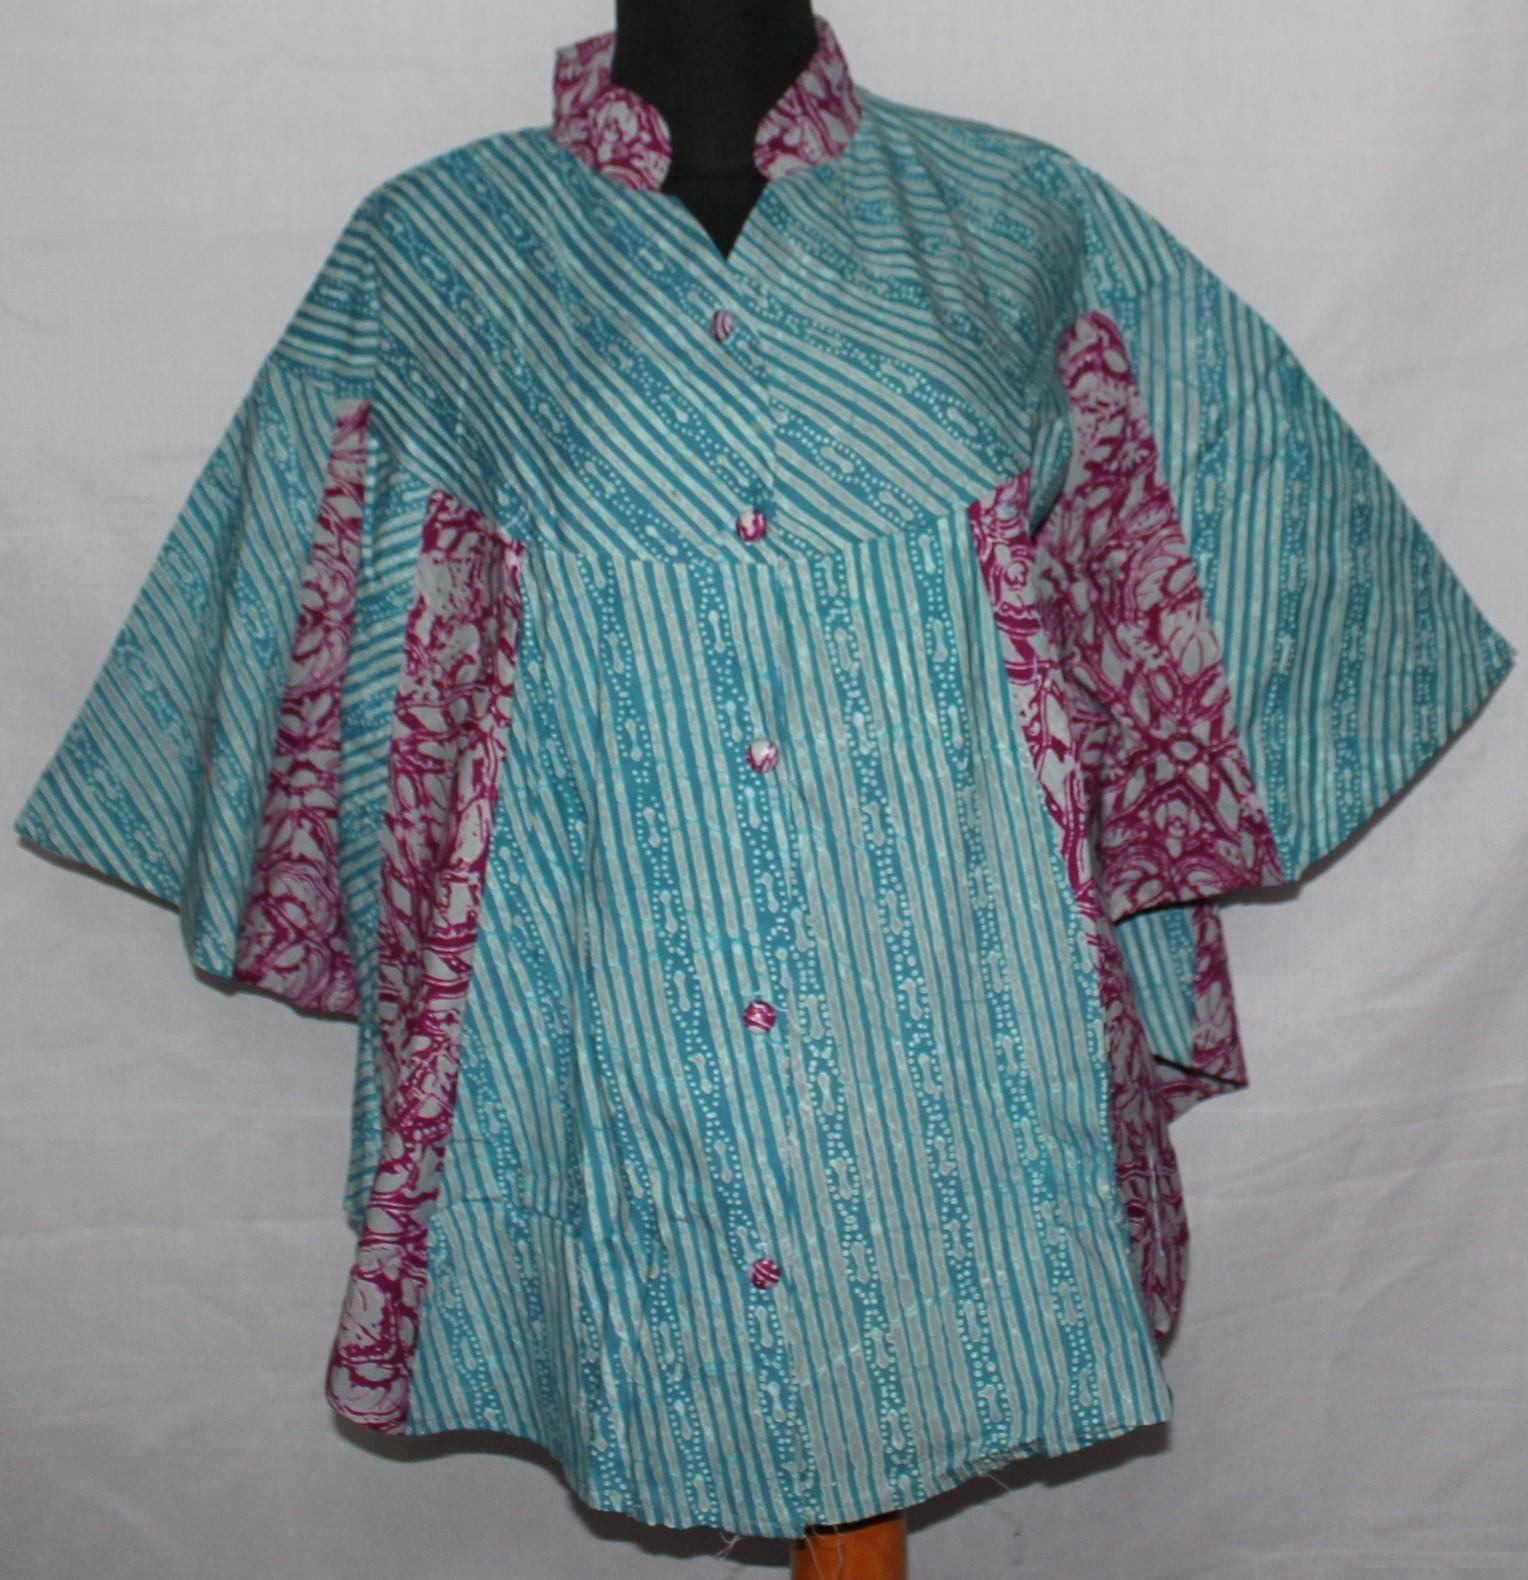 Baju Batik Untuk Wanita Hamil Hubungi Ibu Shinta